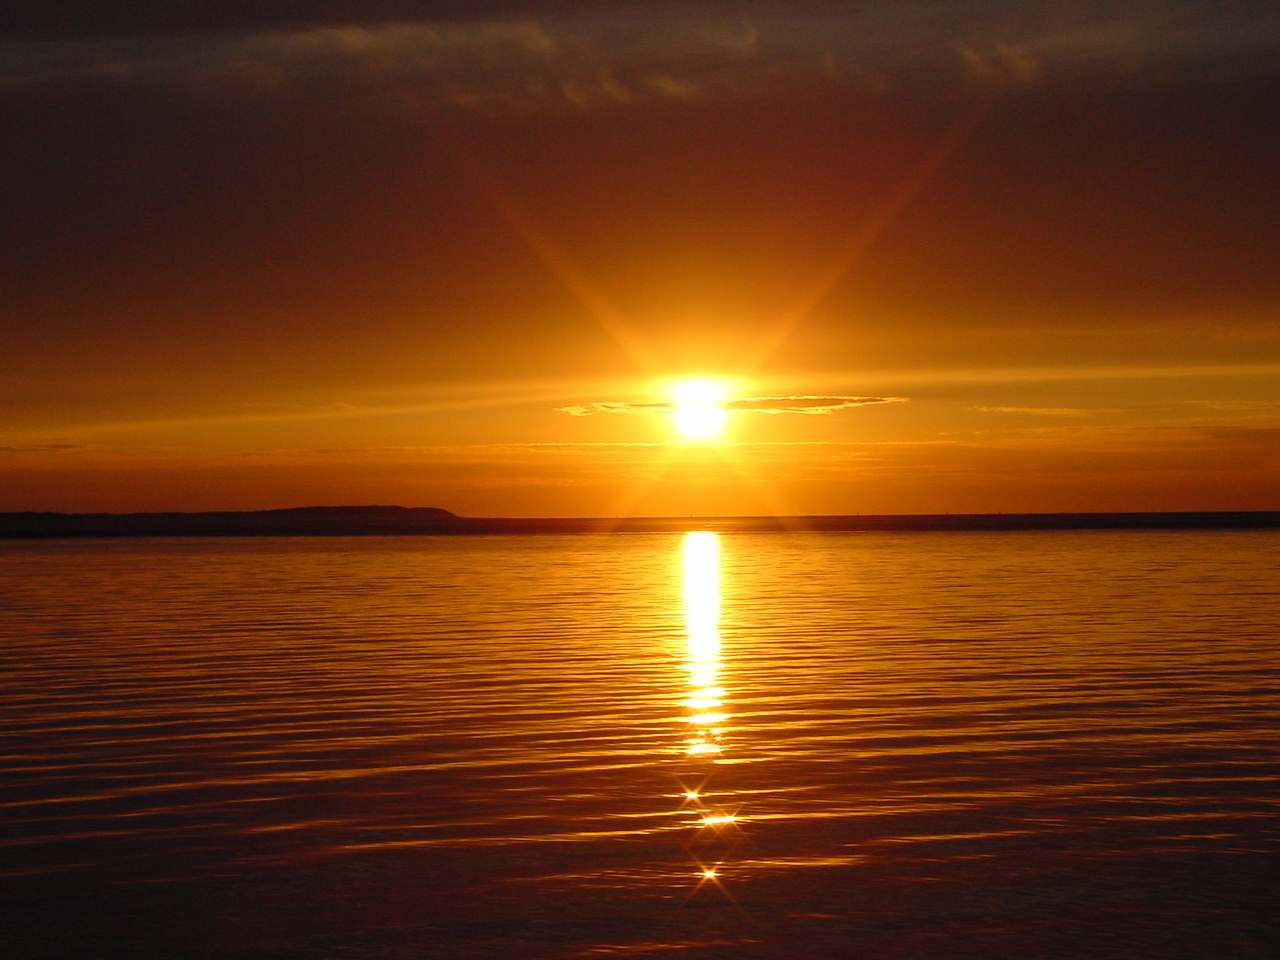 fondos del sol expectacular mirenlo ustedes taringa On fondo del sol